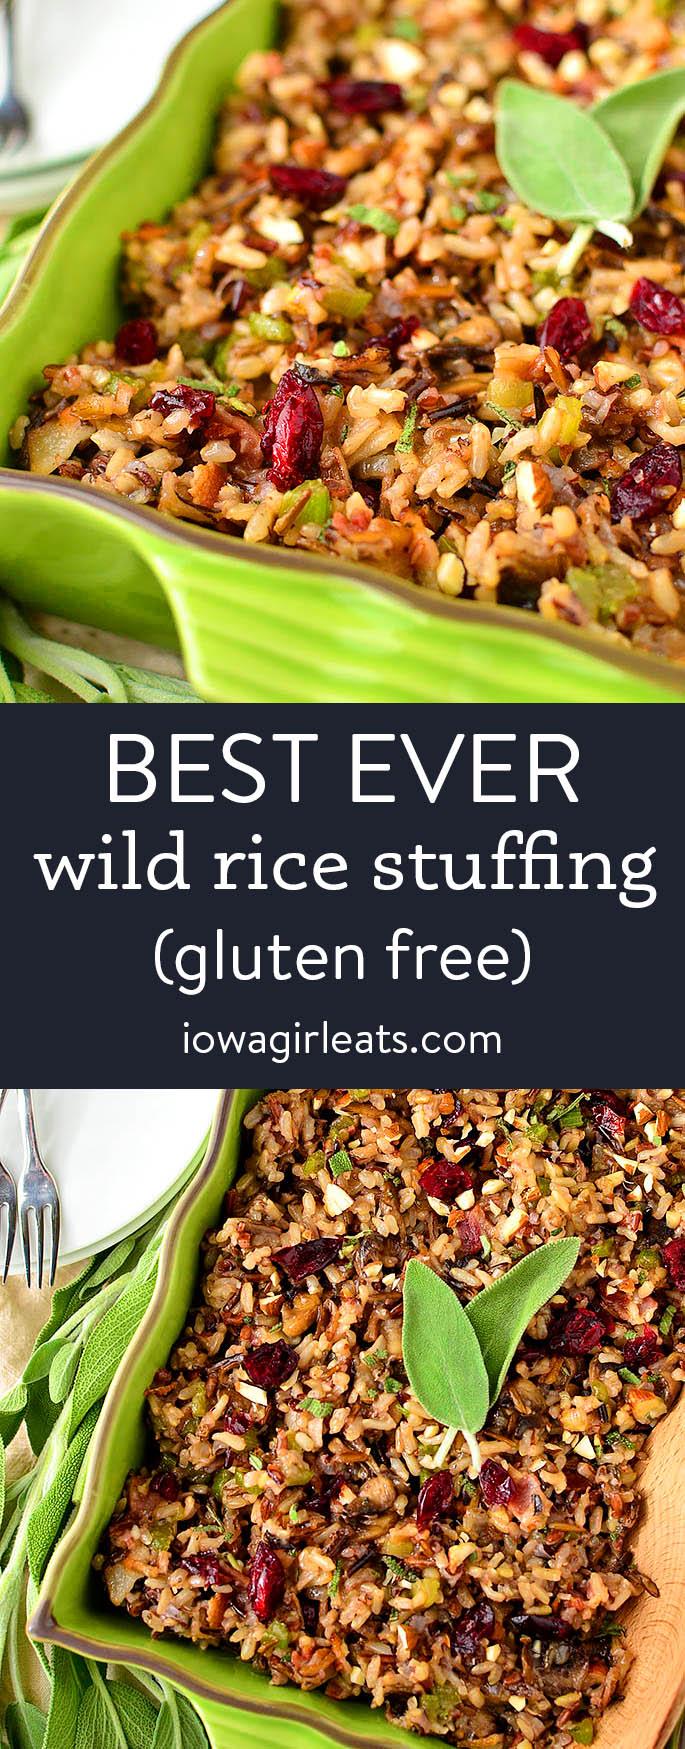 photo collage of gluten free wild rice stuffing